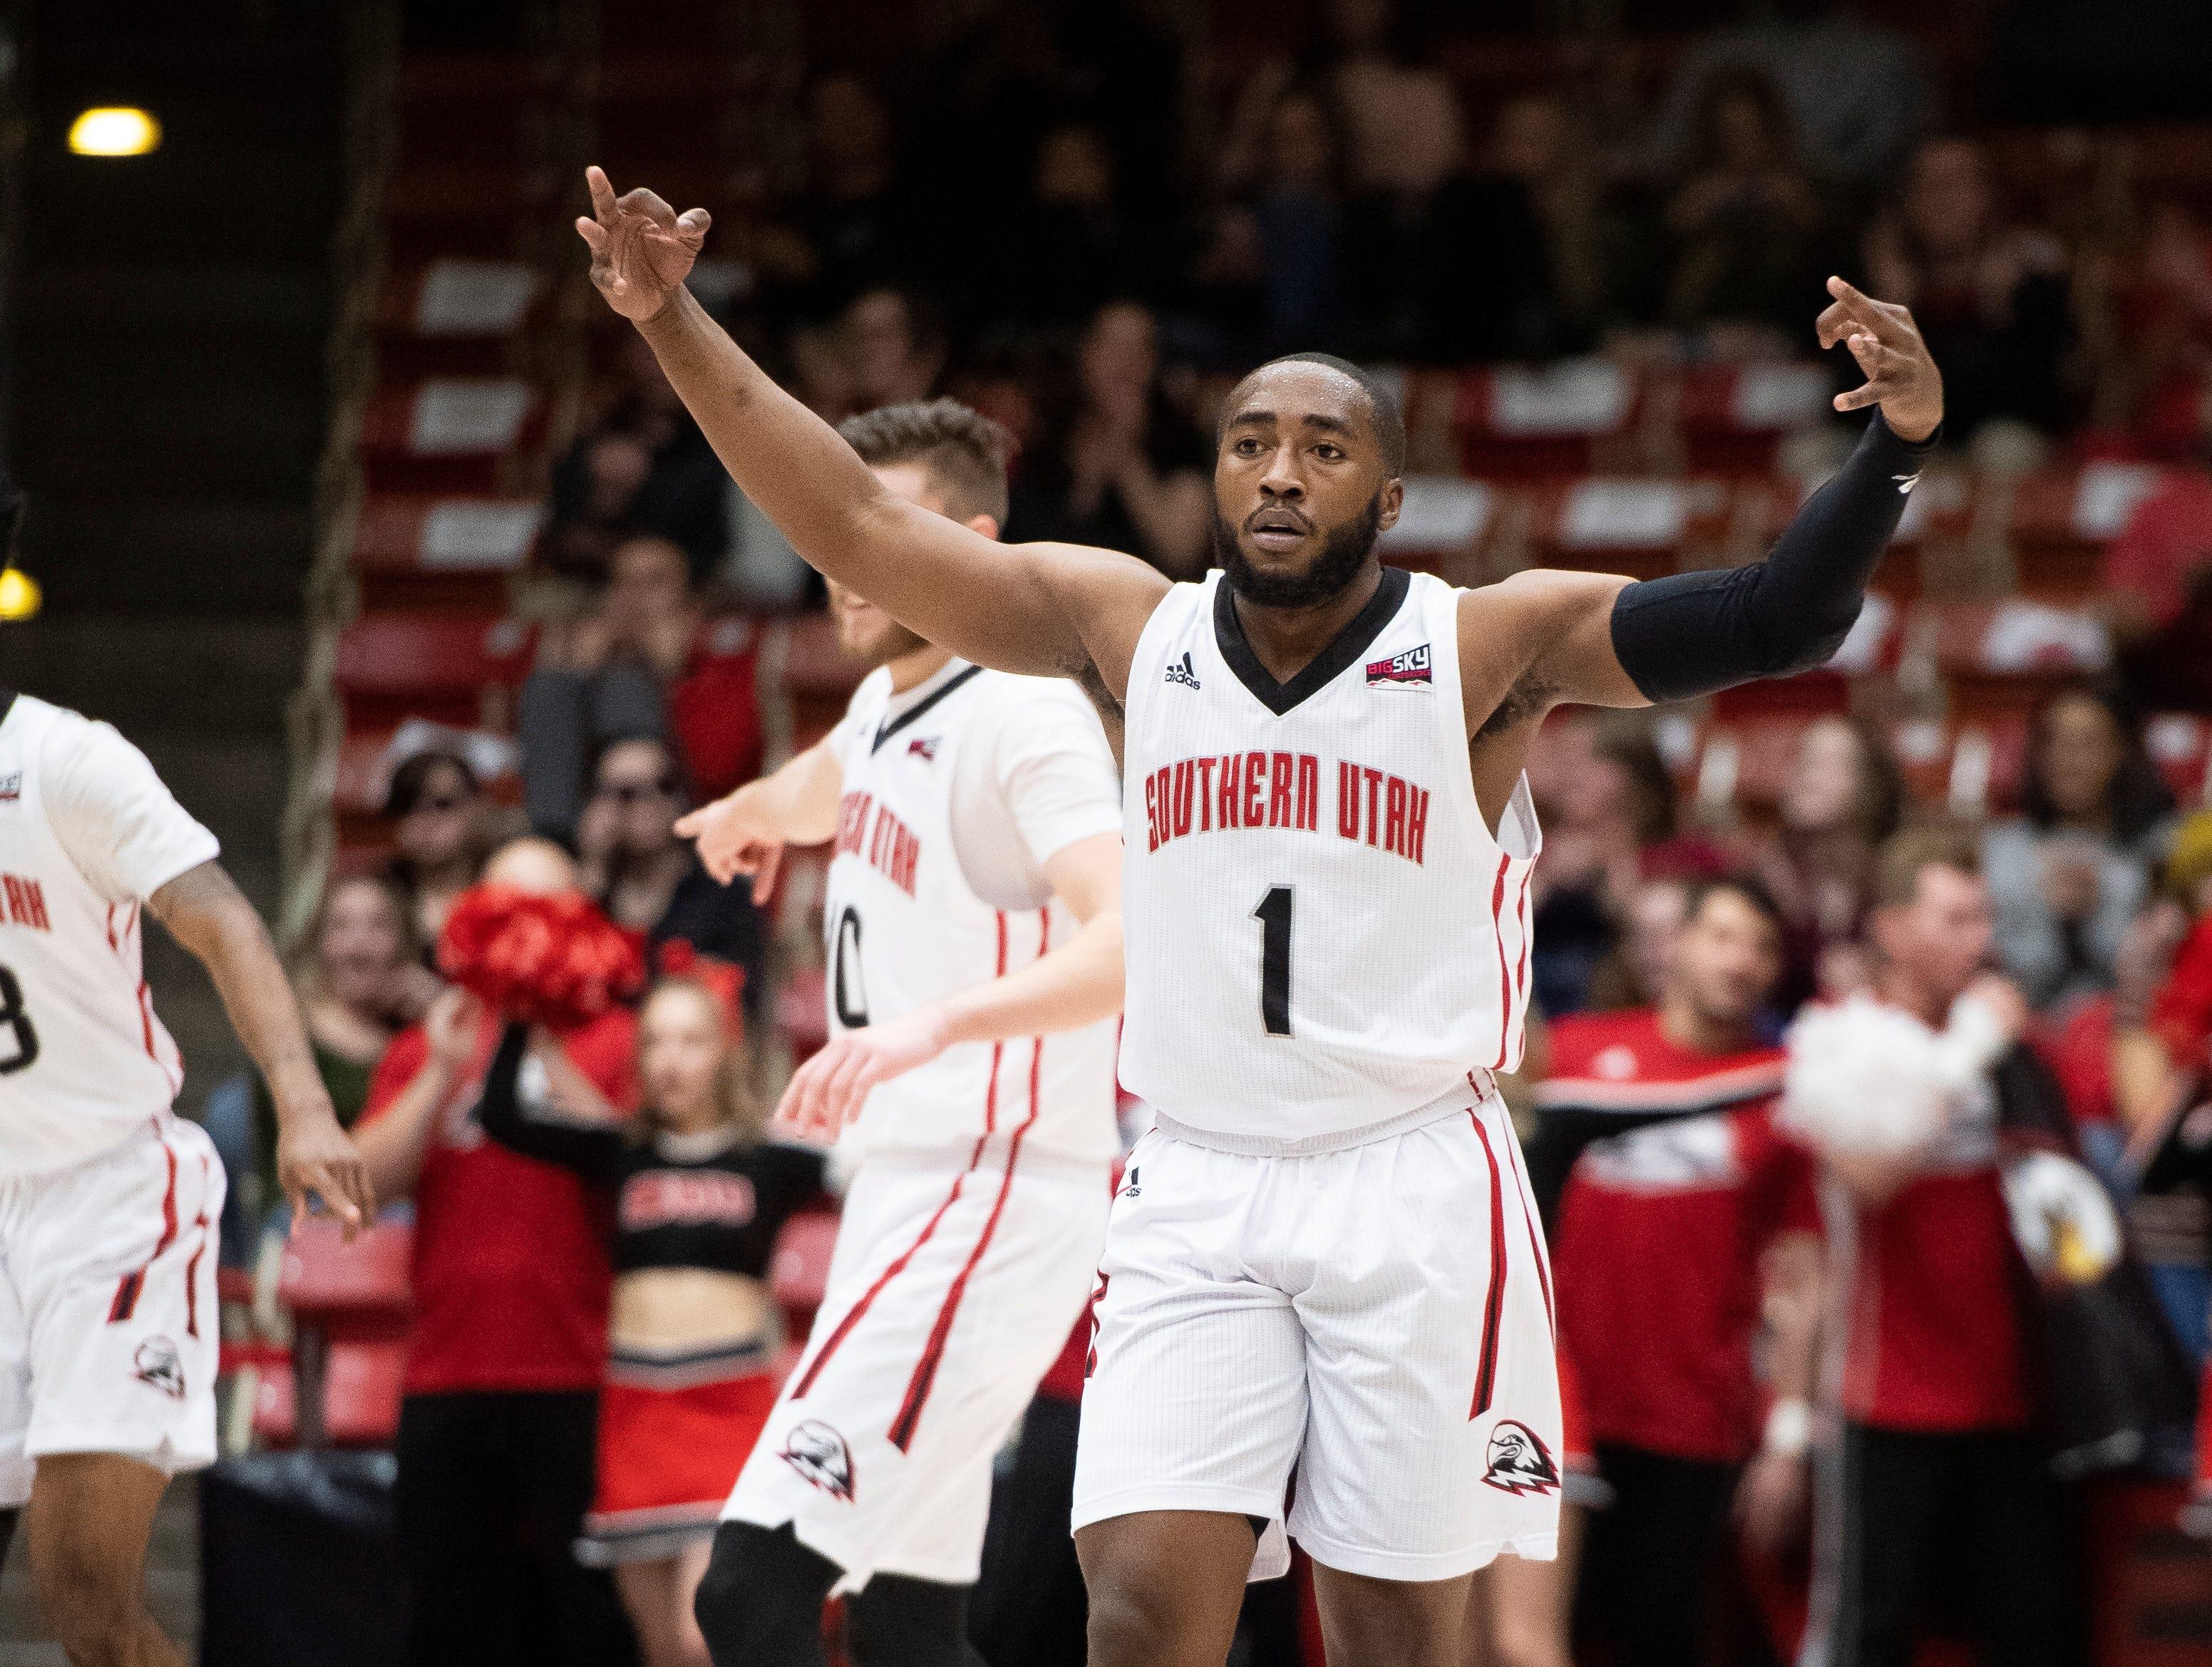 Southern Utah University freshman Kenton Eskridge (1) celebrates a basket against rival Northern Arizona at the America First Event Center Saturday, January 12, 2019. SUU won, 84-82.